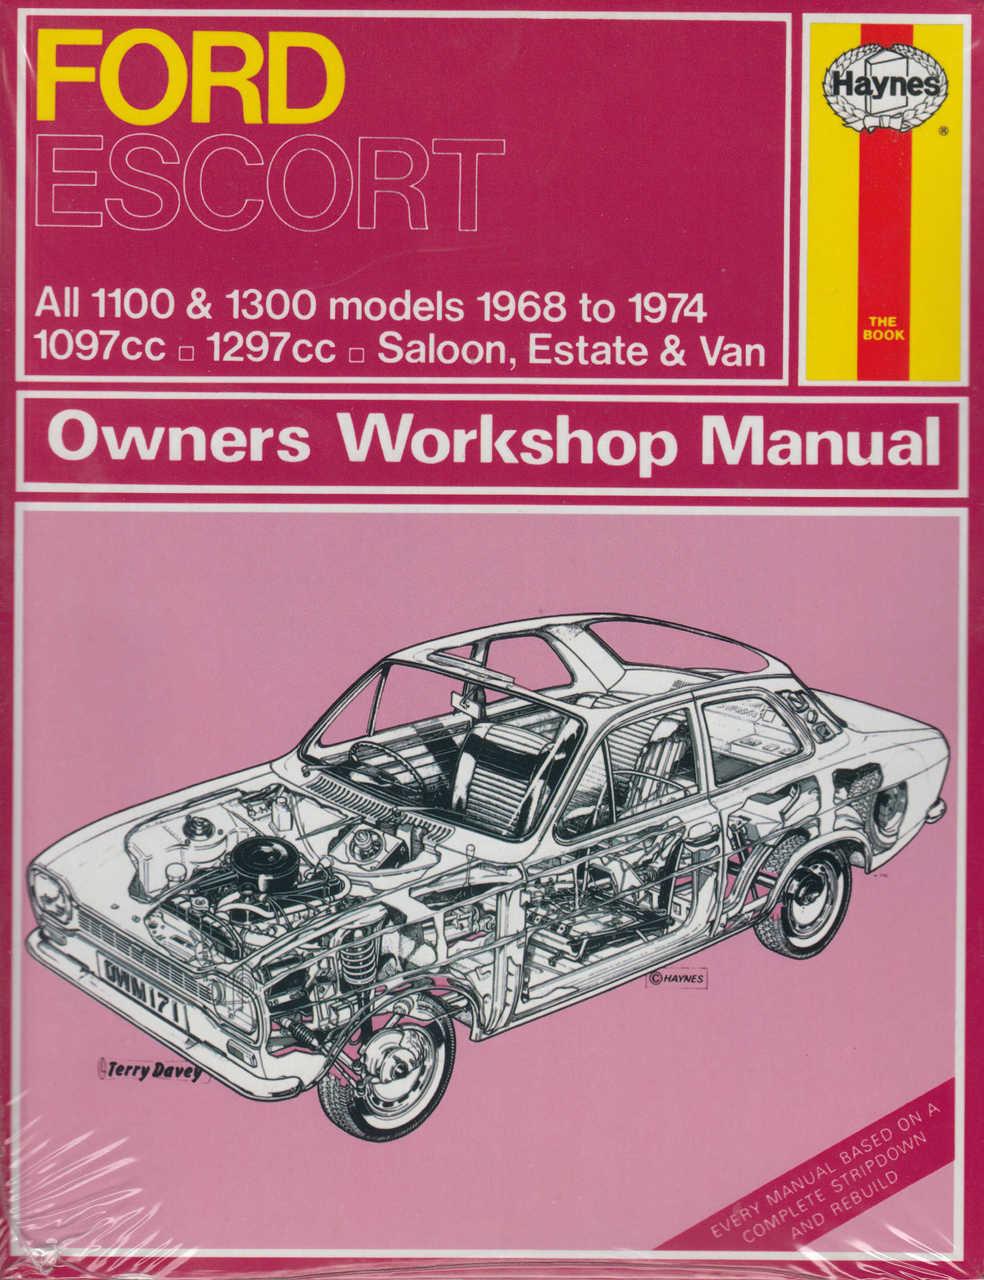 ford escort mk 1 all 1100 1300 models 1968 to 1974 owners workshop rh automotobookshop com au Ford Focus 2013 Ford Escape